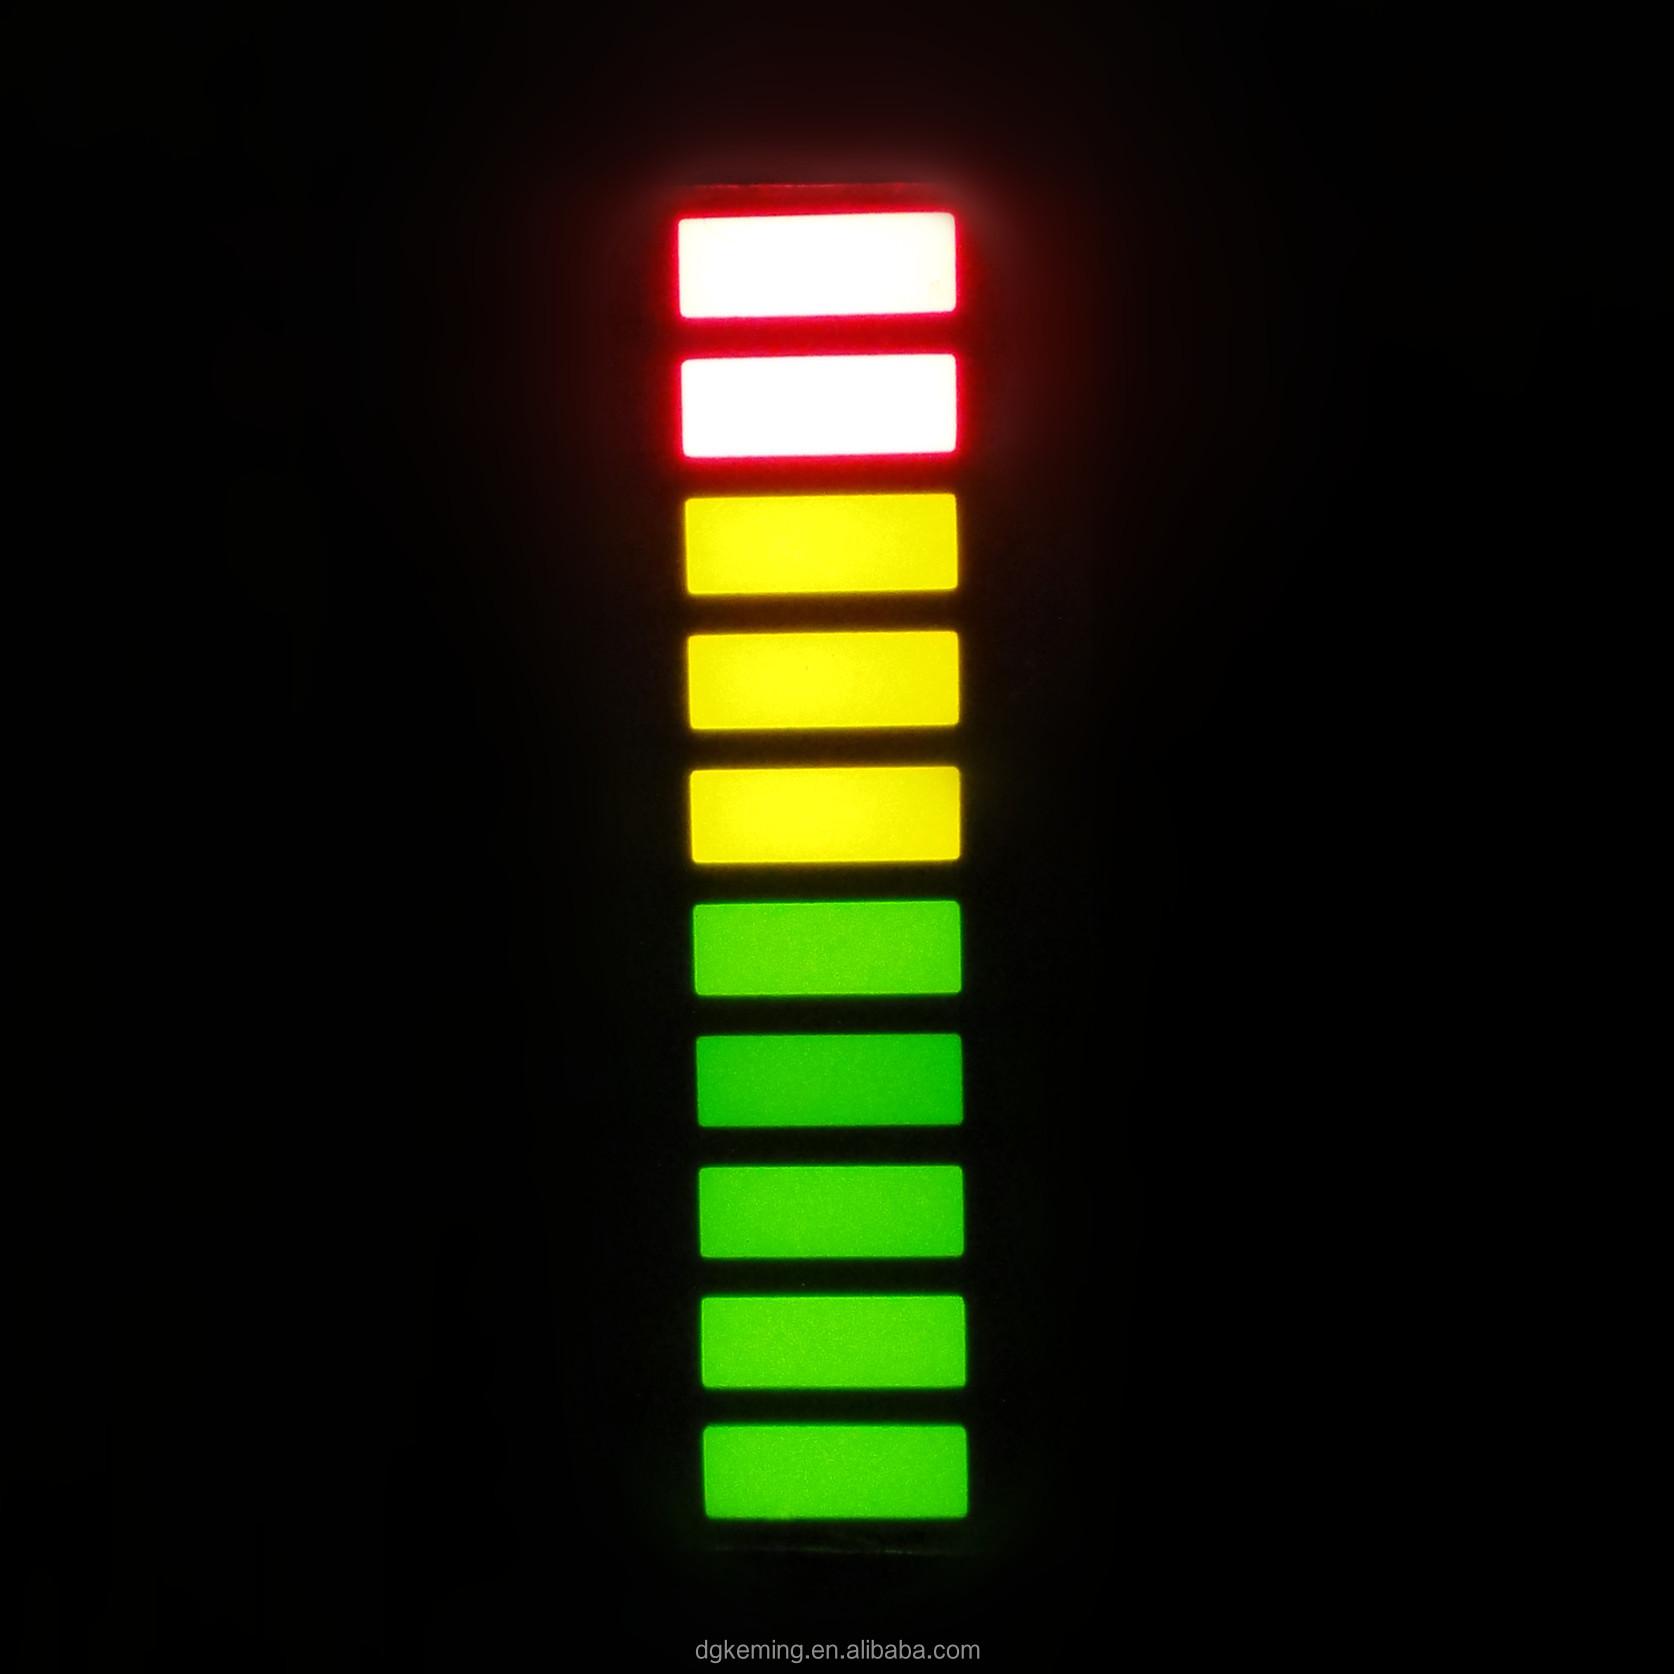 rgb led bar 10 segment display triple 3 colors graph led bar